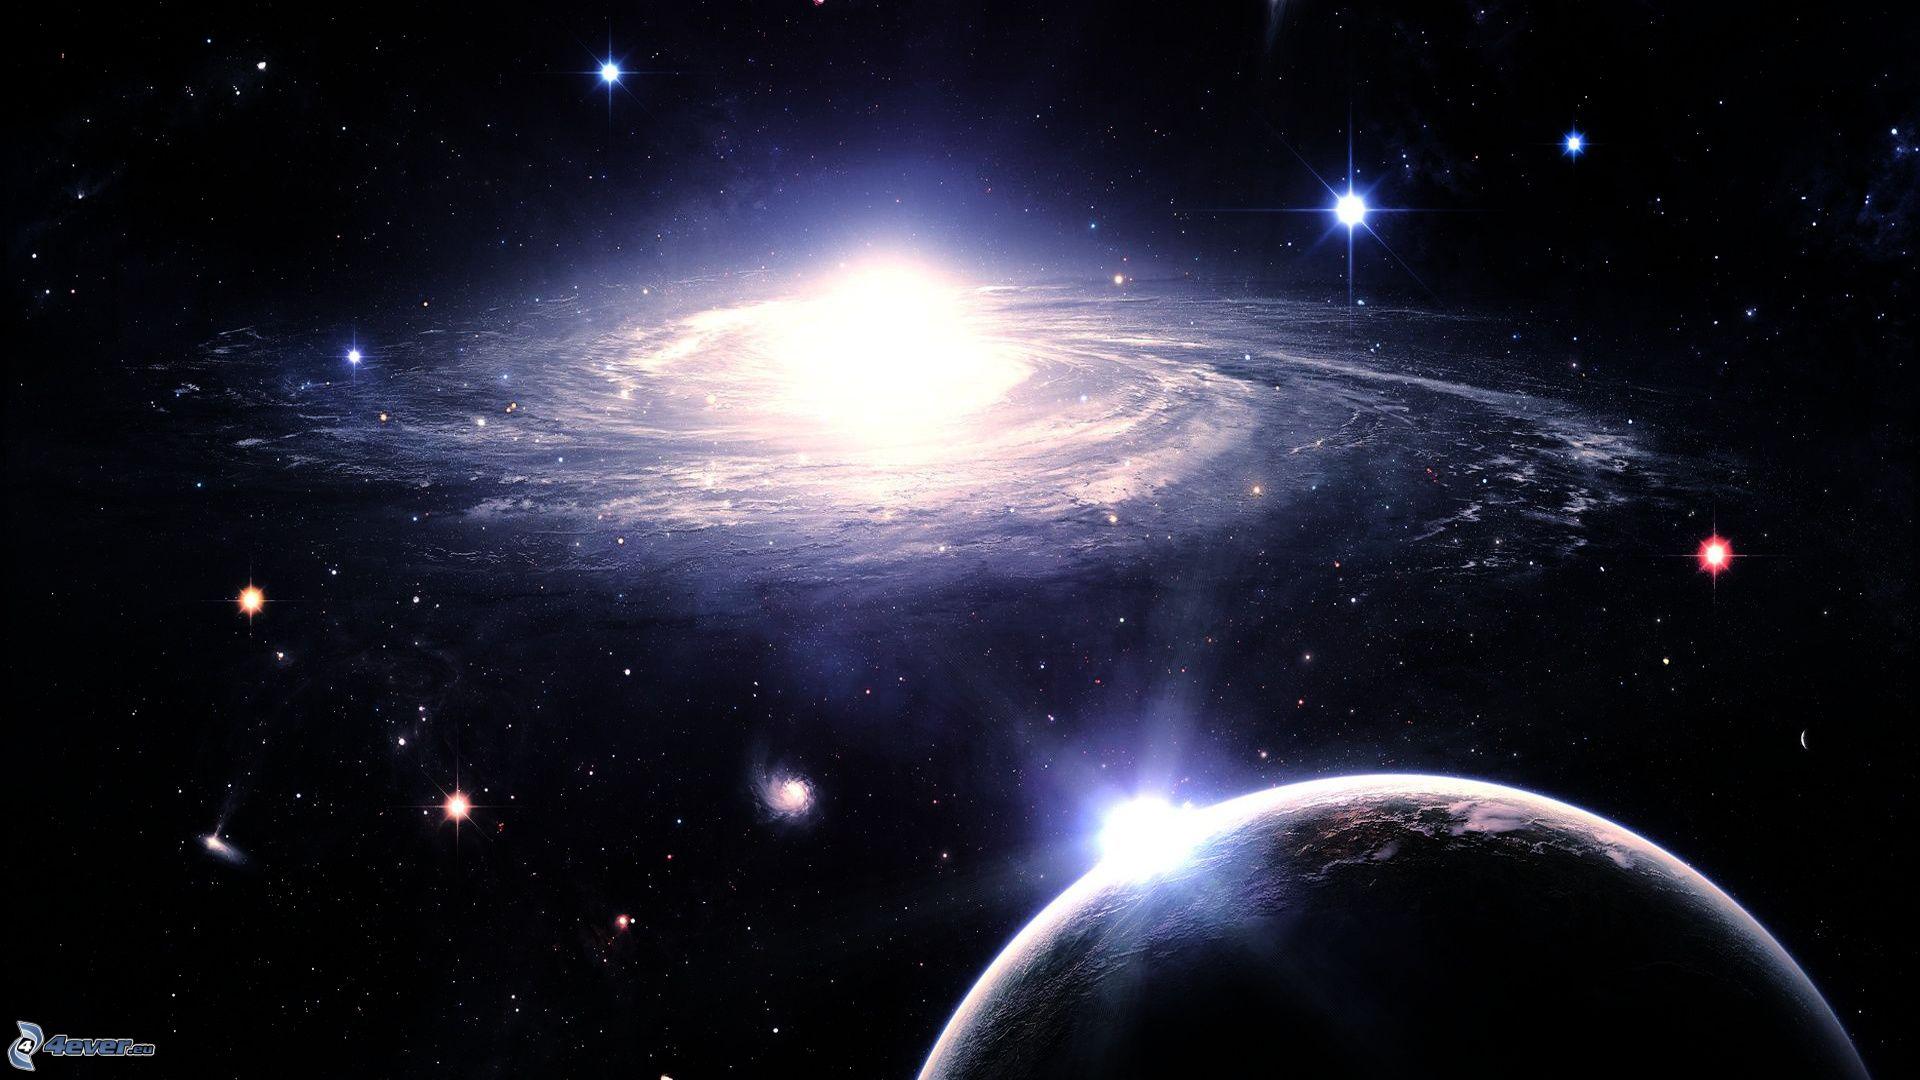 Galaxia for Foto galassie hd